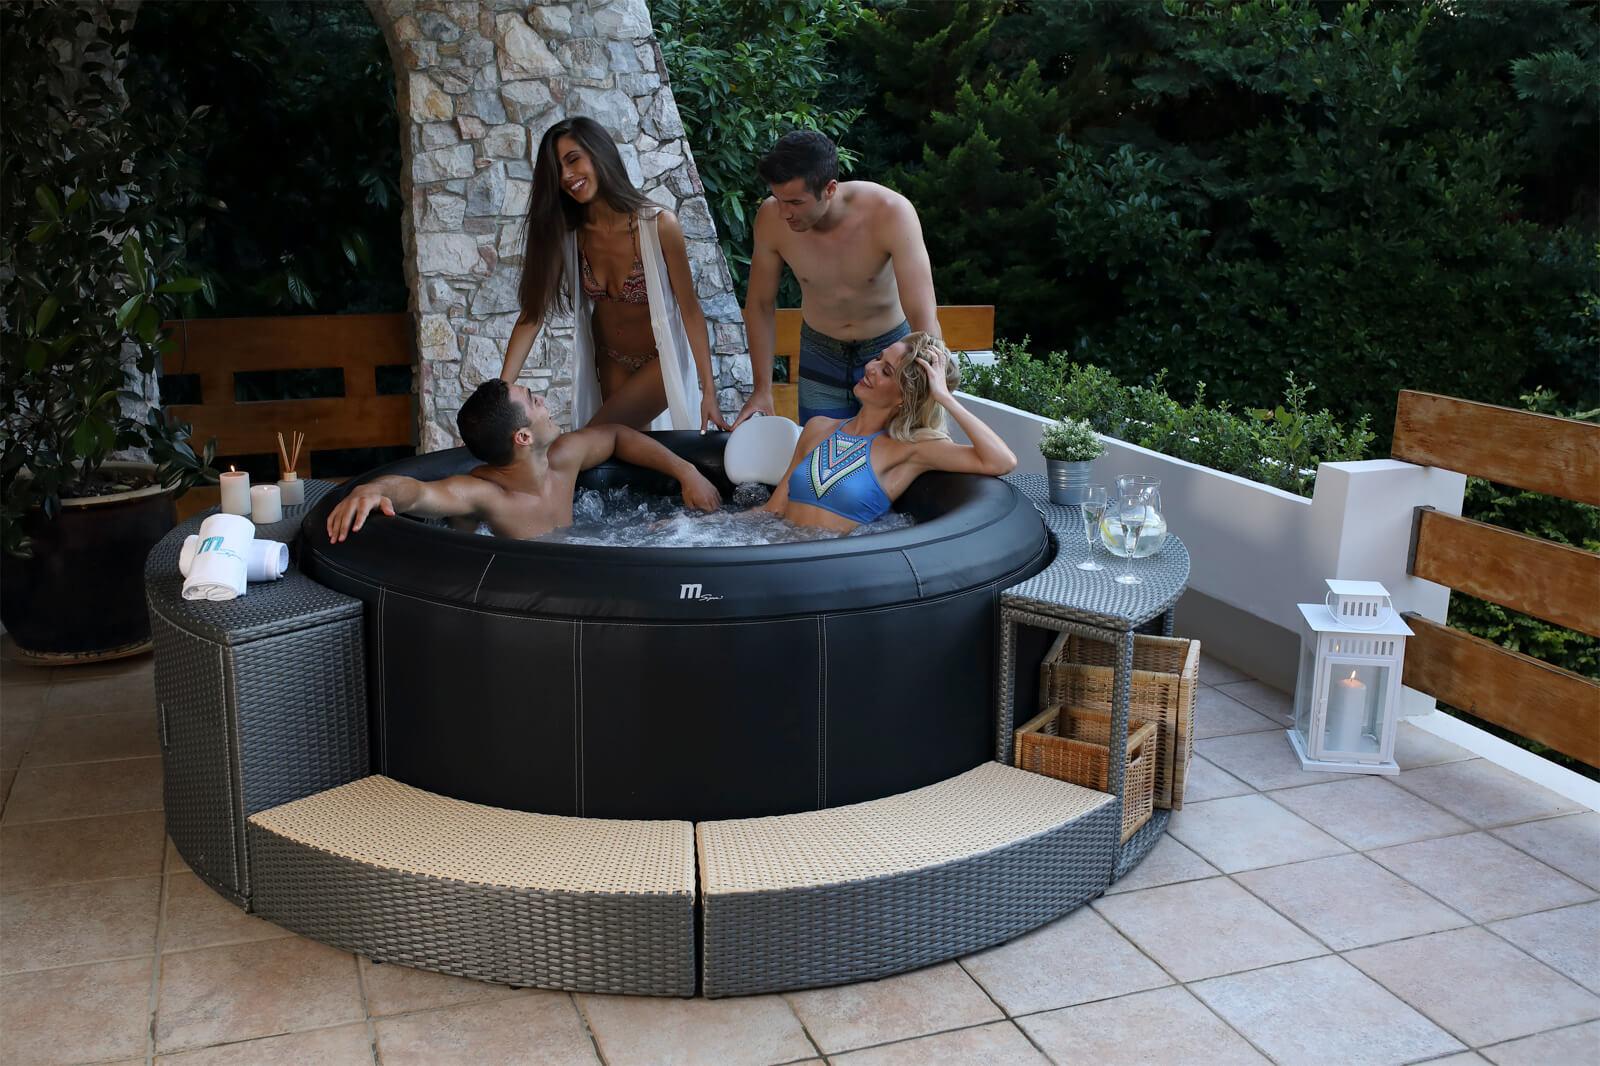 MSpa Premium 6 Personen Whirlpool Camaro P-CA069 Indoor + Outdoor Pool